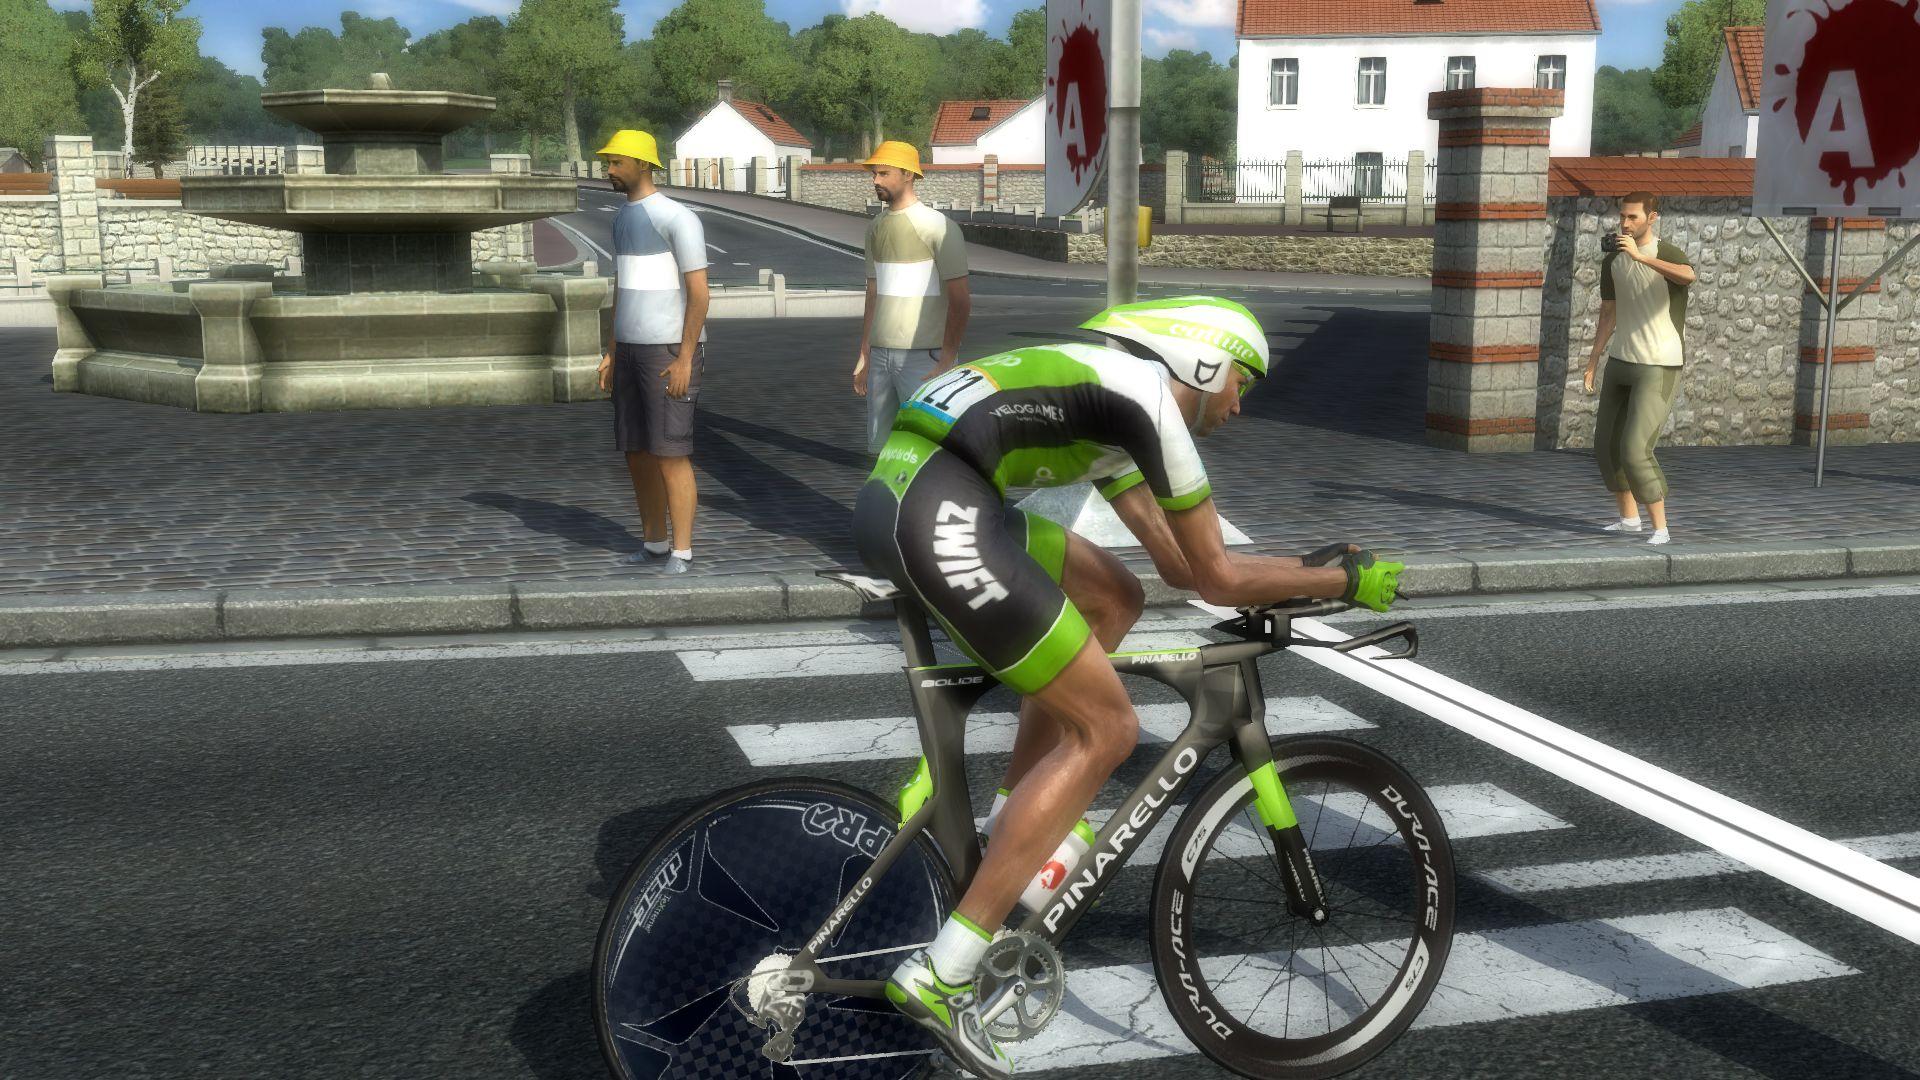 pcmdaily.com/images/mg/2019/Races/C1/Bayern/S4/mg19_bay_s04_38.jpg